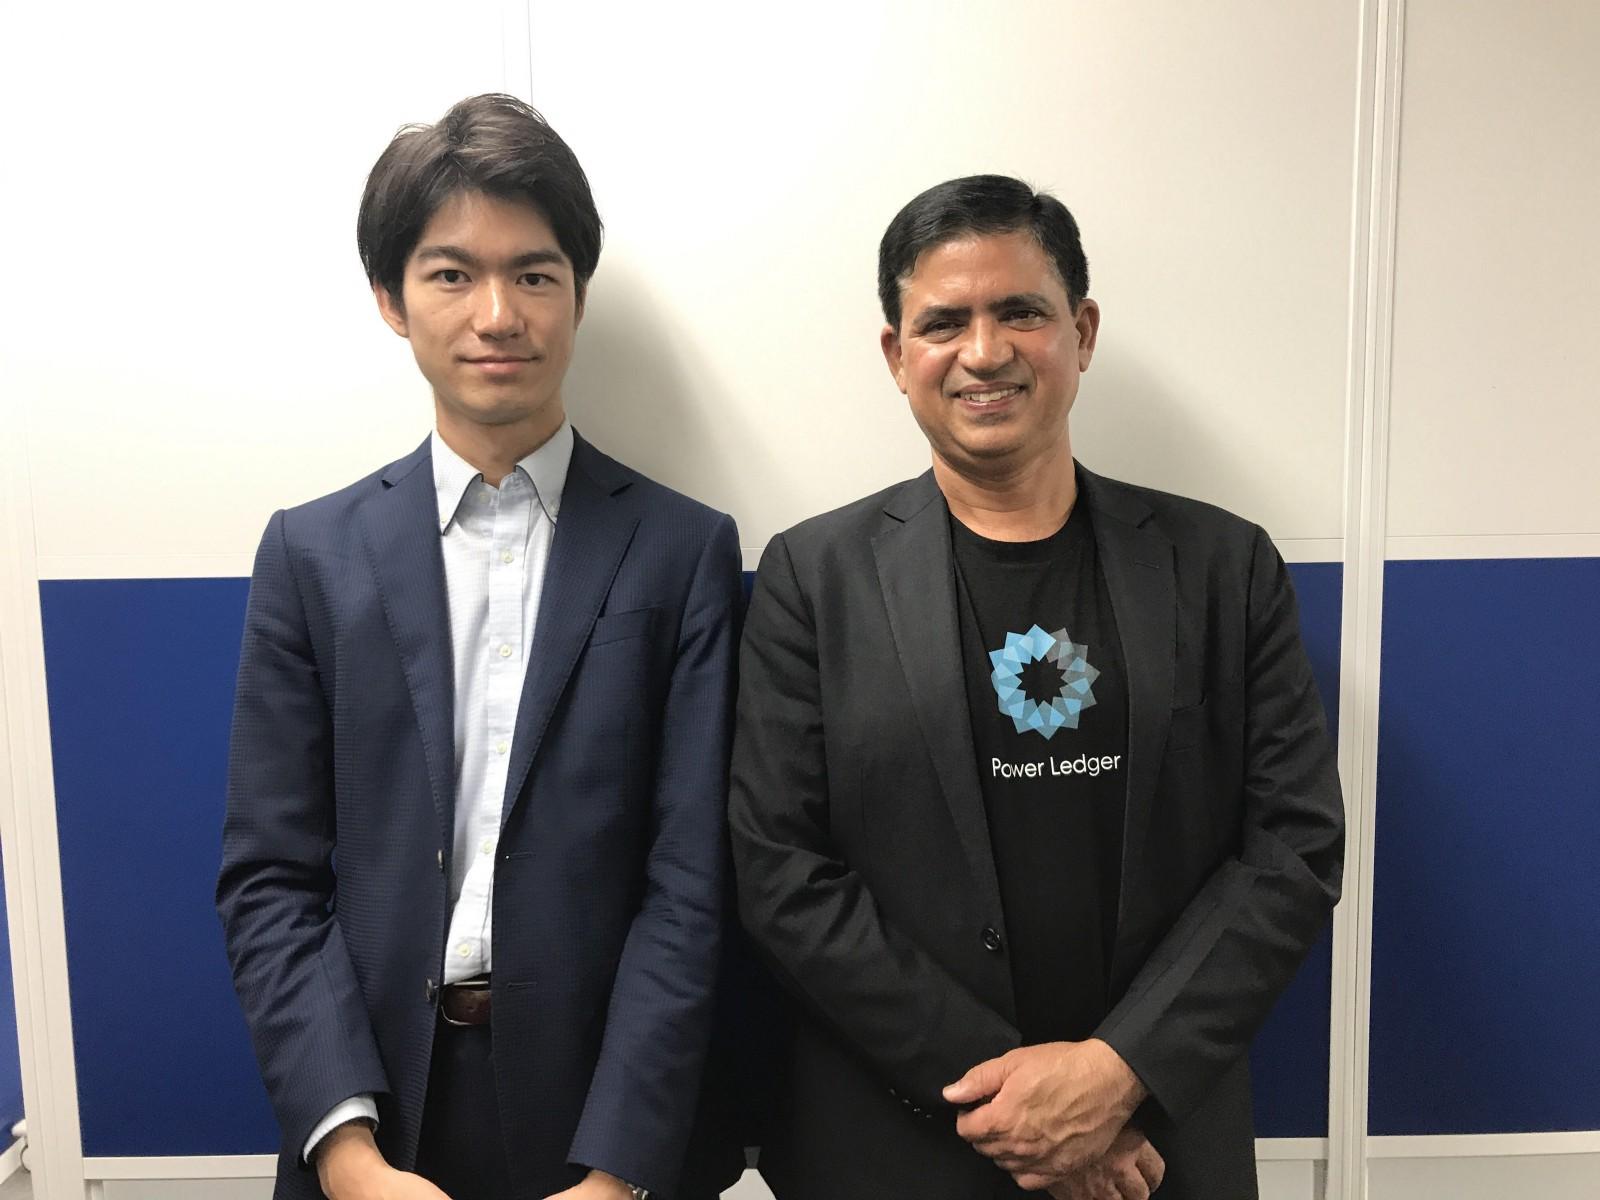 Power Ledger & Sharing Energy announce partnership to evolve renewable energy in Japan